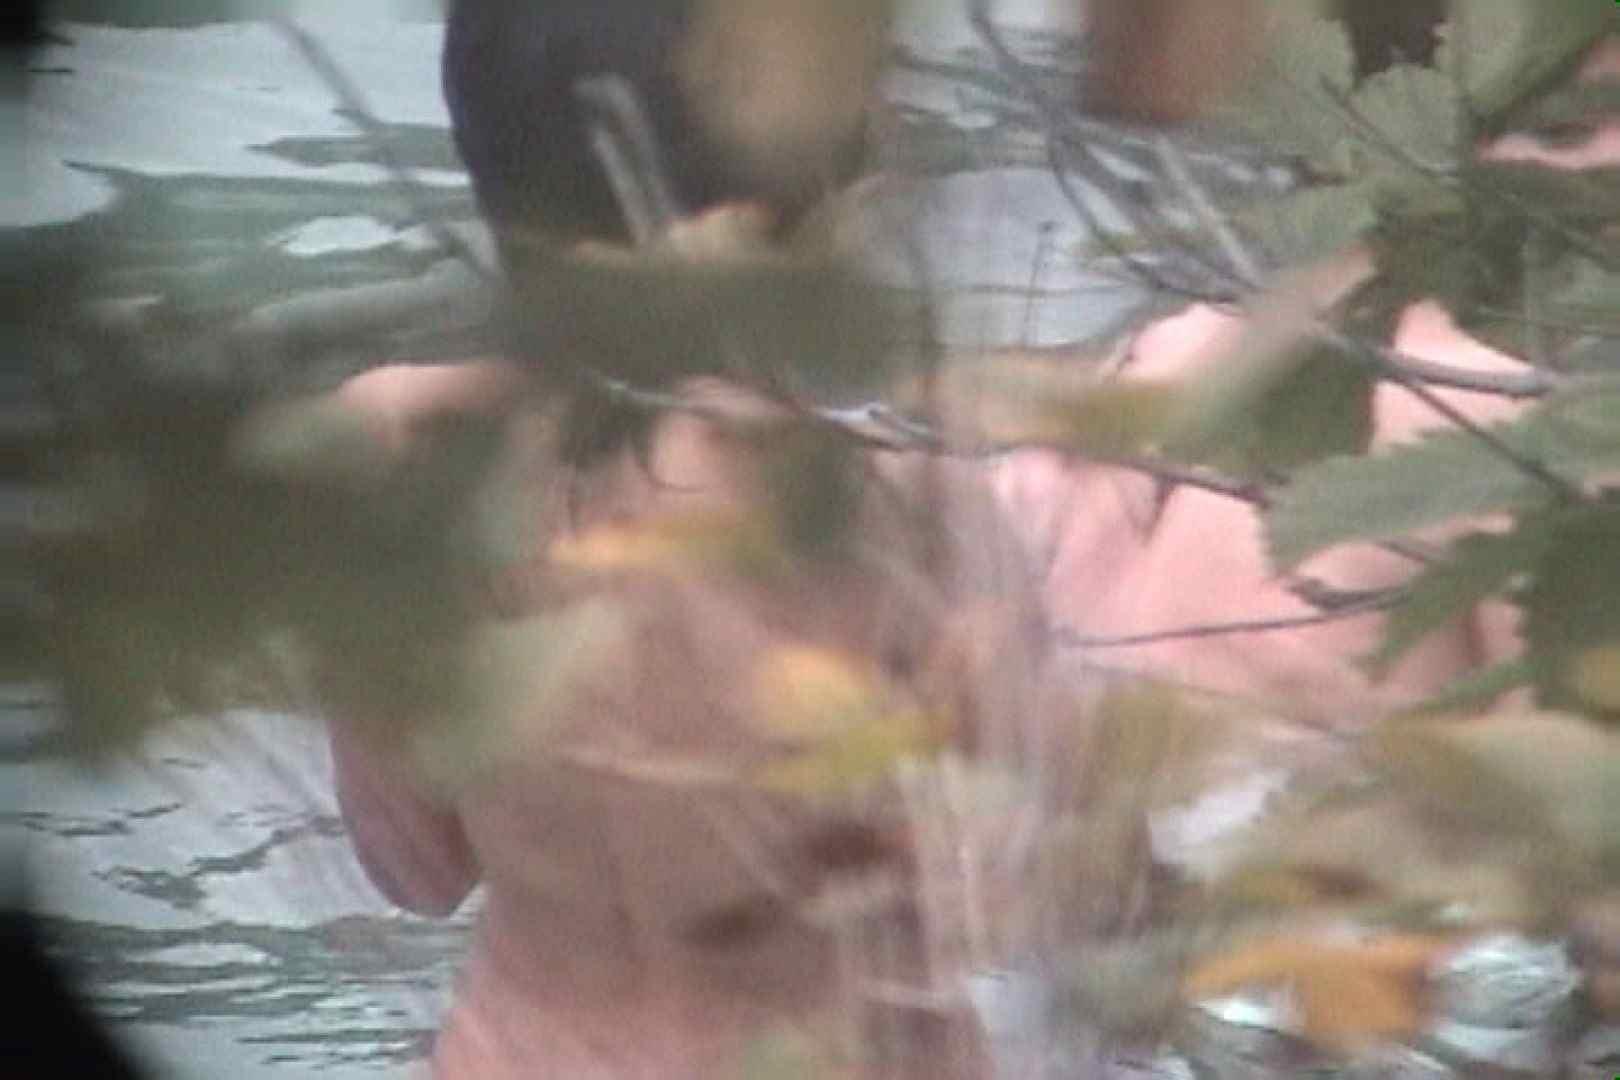 Aquaな露天風呂Vol.71【VIP限定】 盗撮 のぞき動画画像 107画像 41